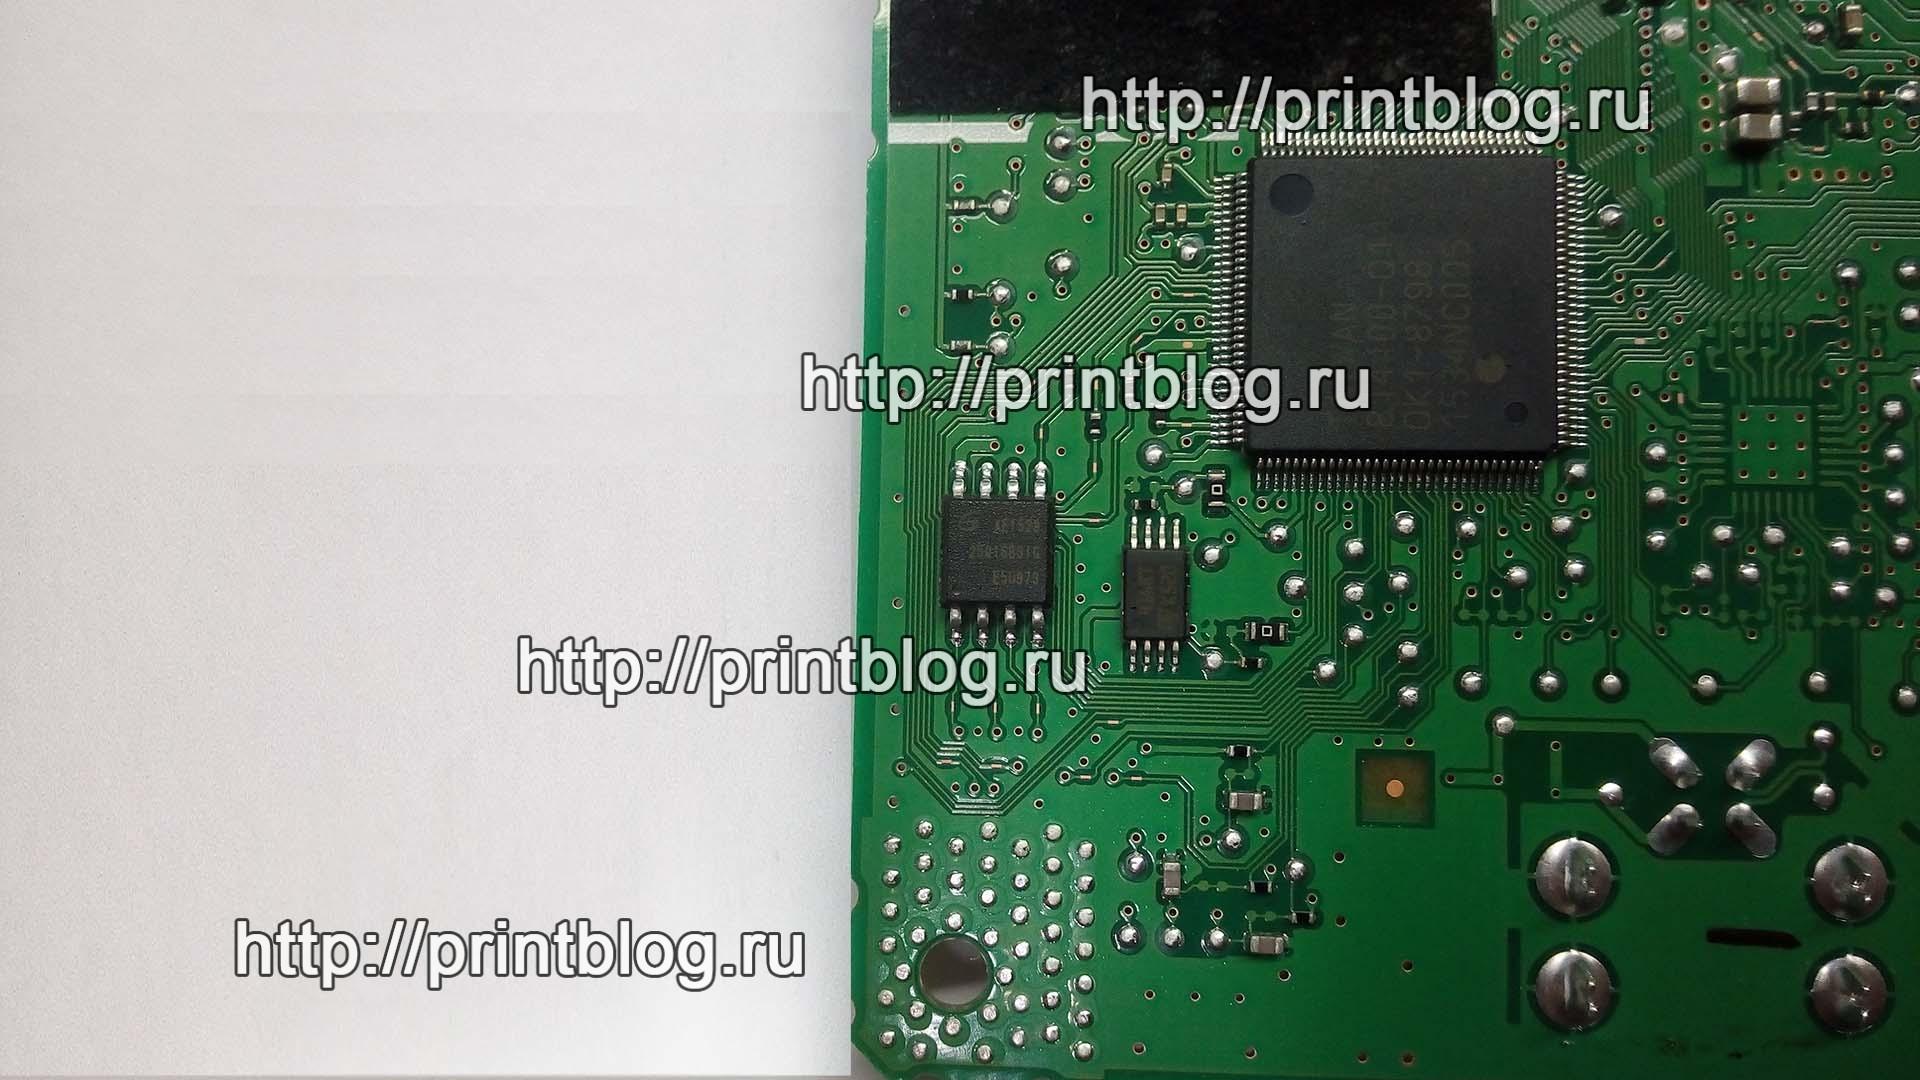 Canon PIXMA G3400, G2400, G1400 сброс ошибки 5B00 (памперс, отработка), сервисный режим, дампы от G3400, G2400, G1400